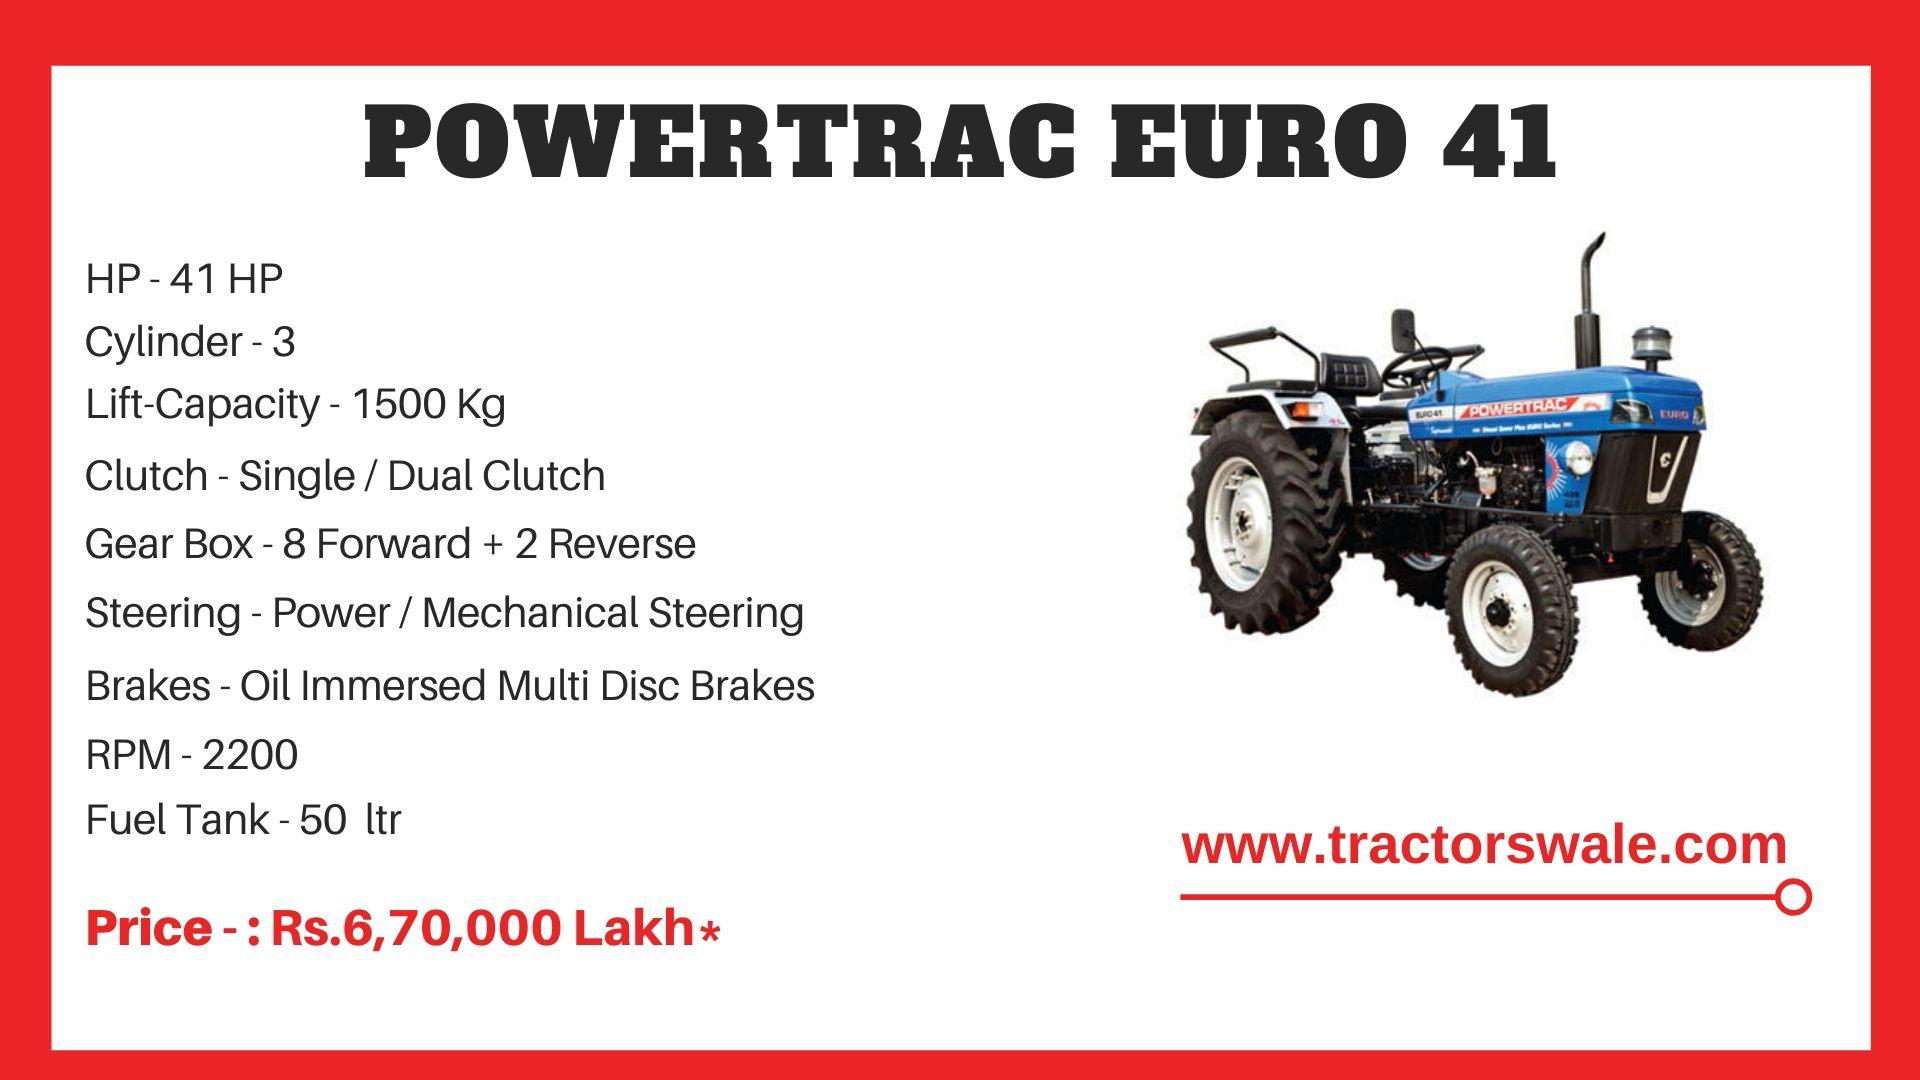 PowerTrac Euro 41 tractor price